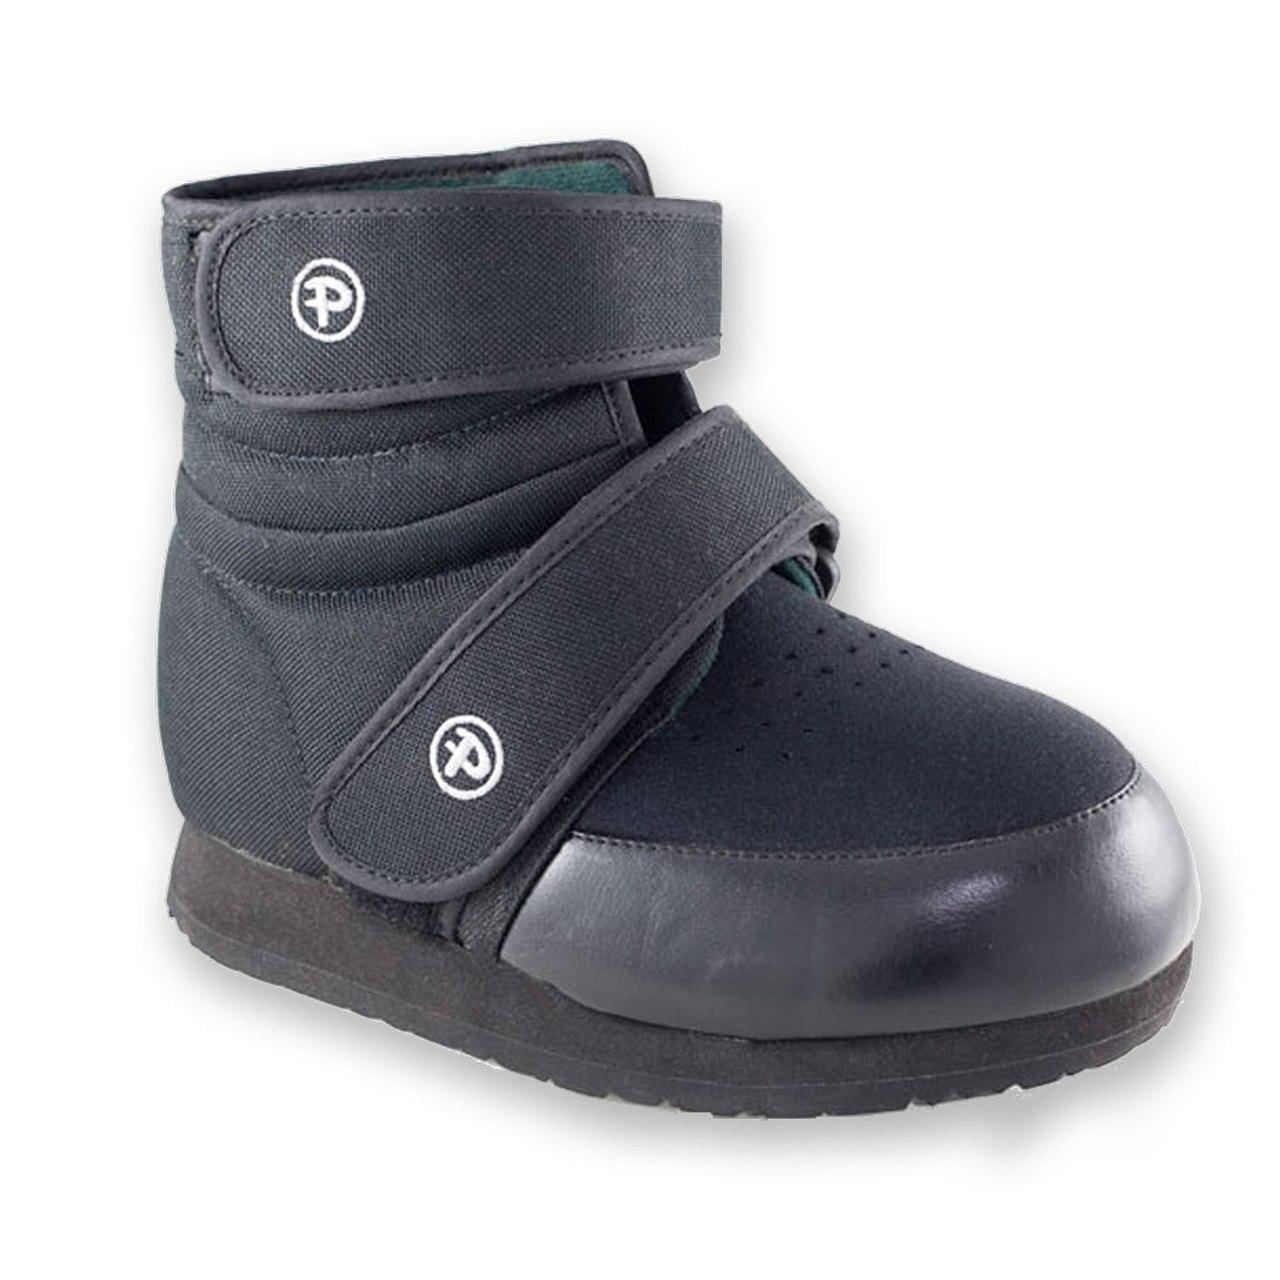 Pedors Unisex High-Top Black Orthopedic Boots (Pair)